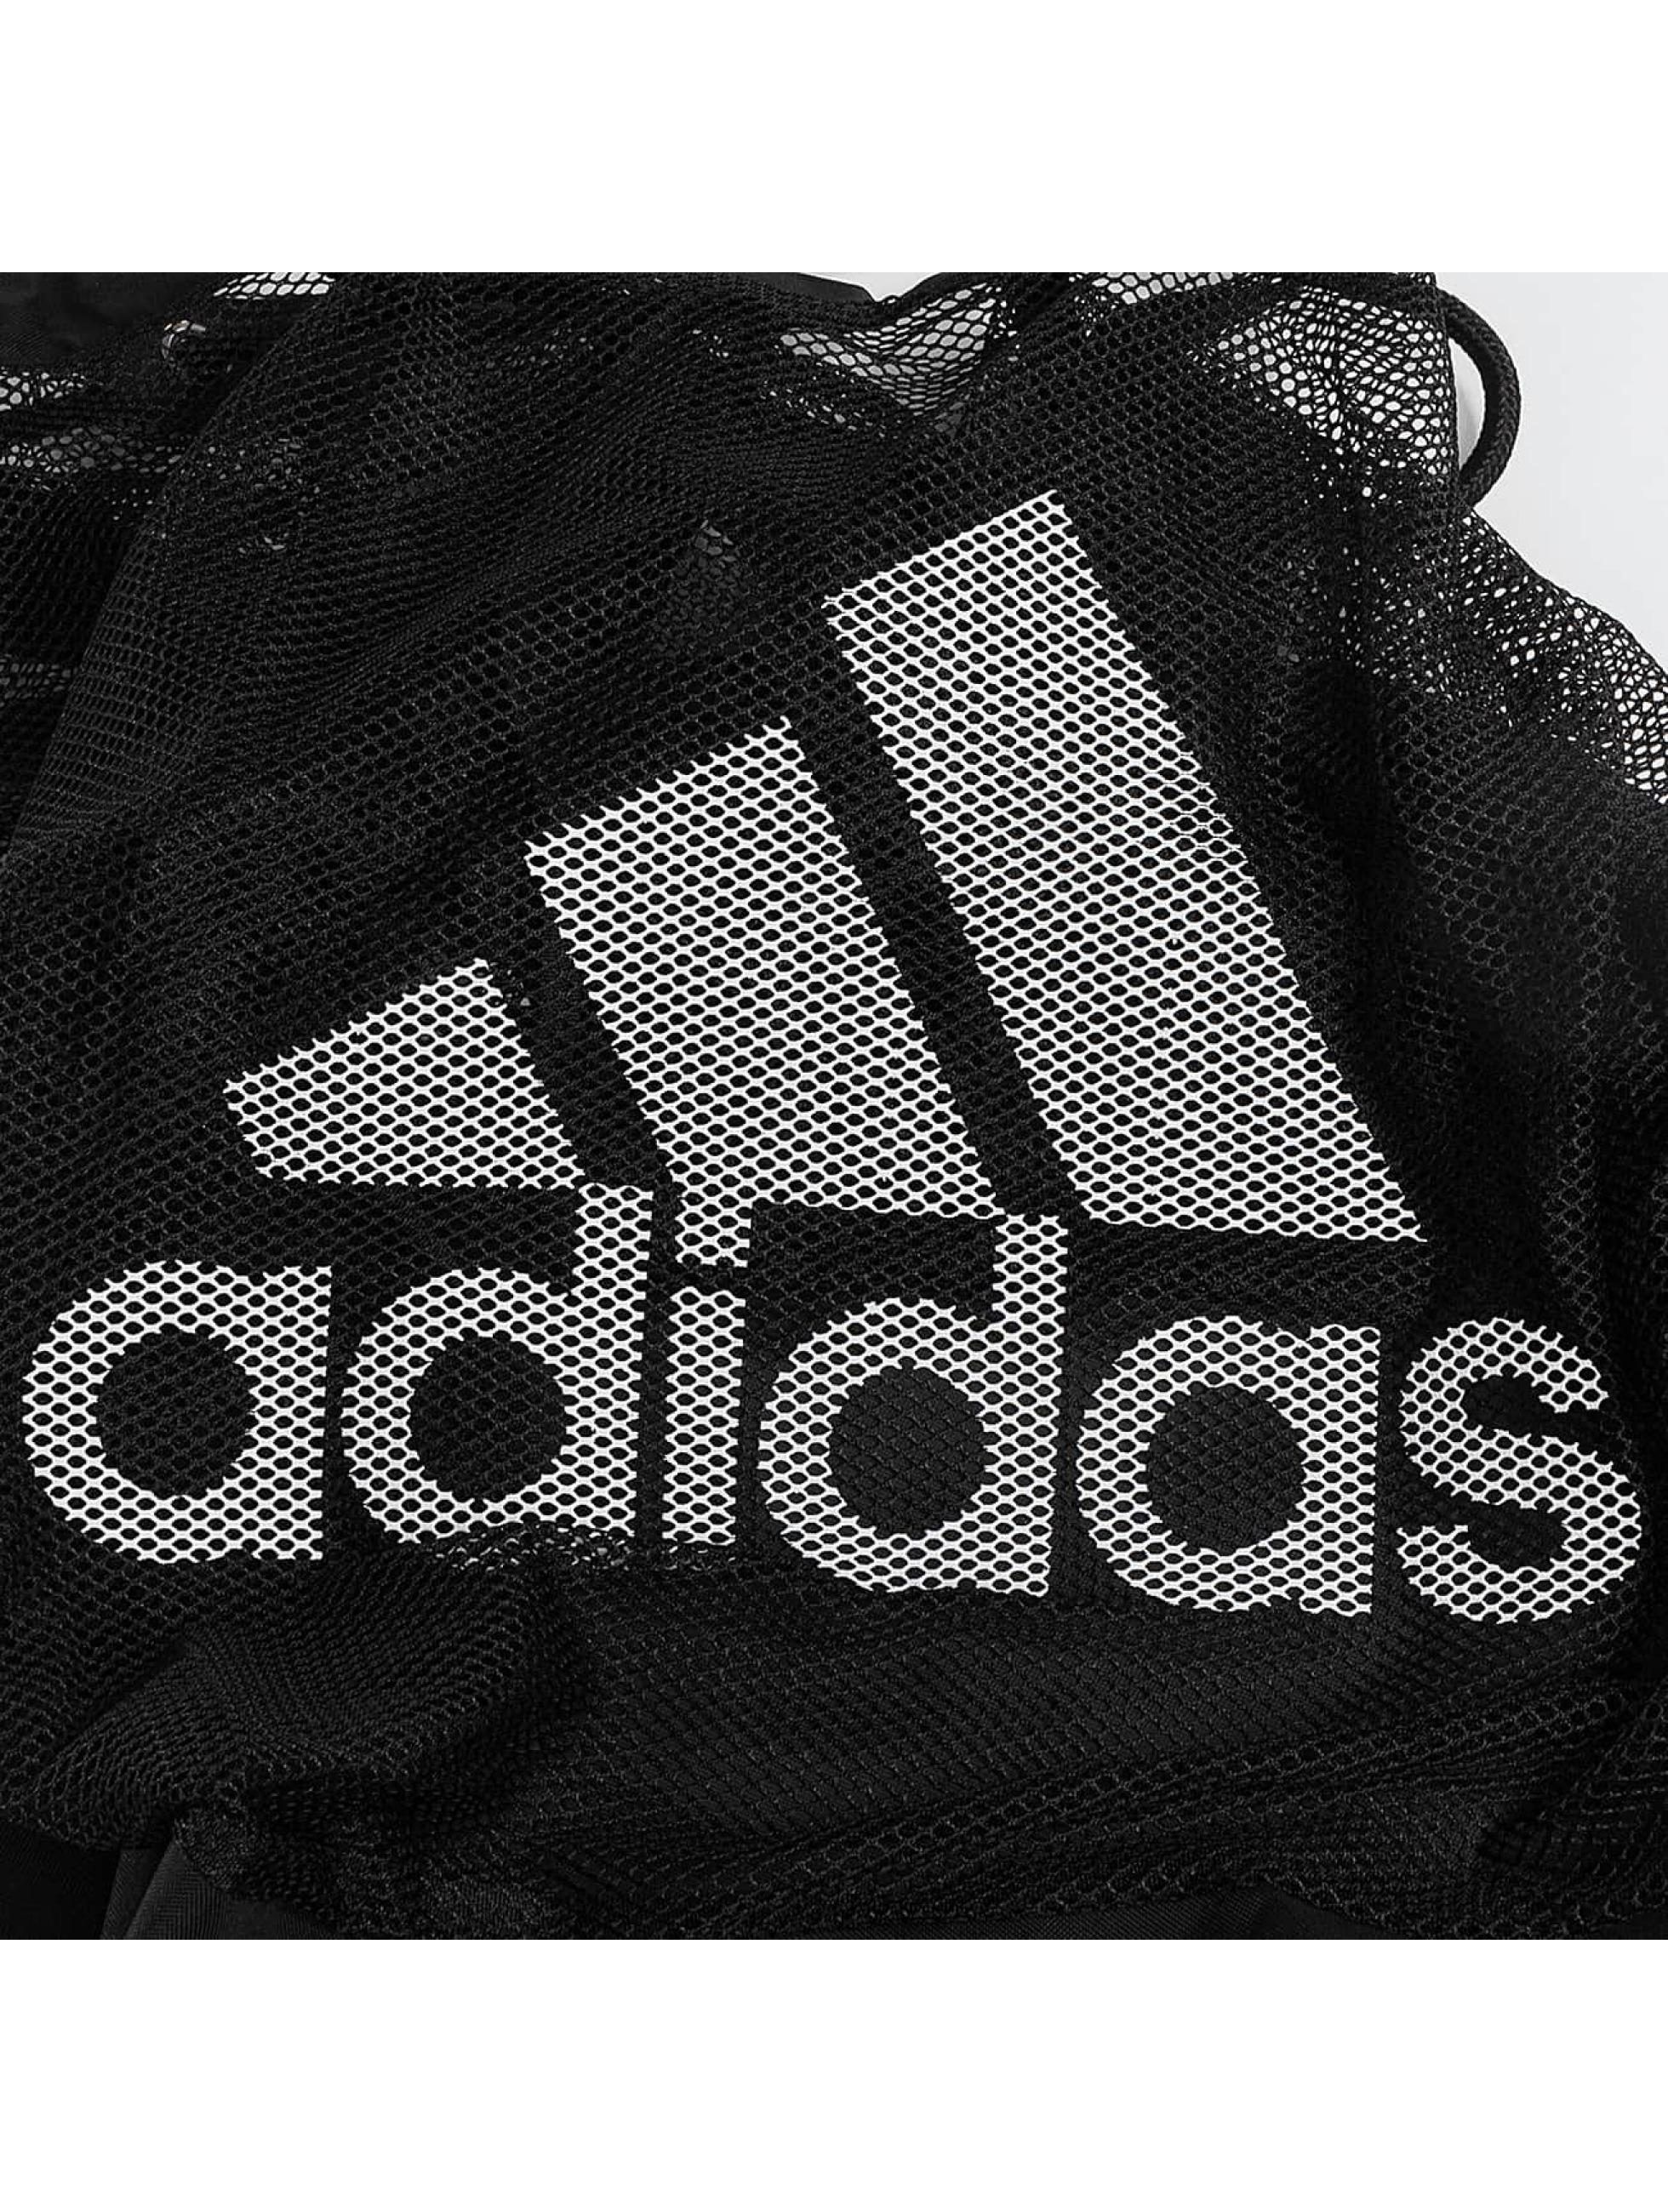 adidas originals Diverse Soccer Ball Net sort